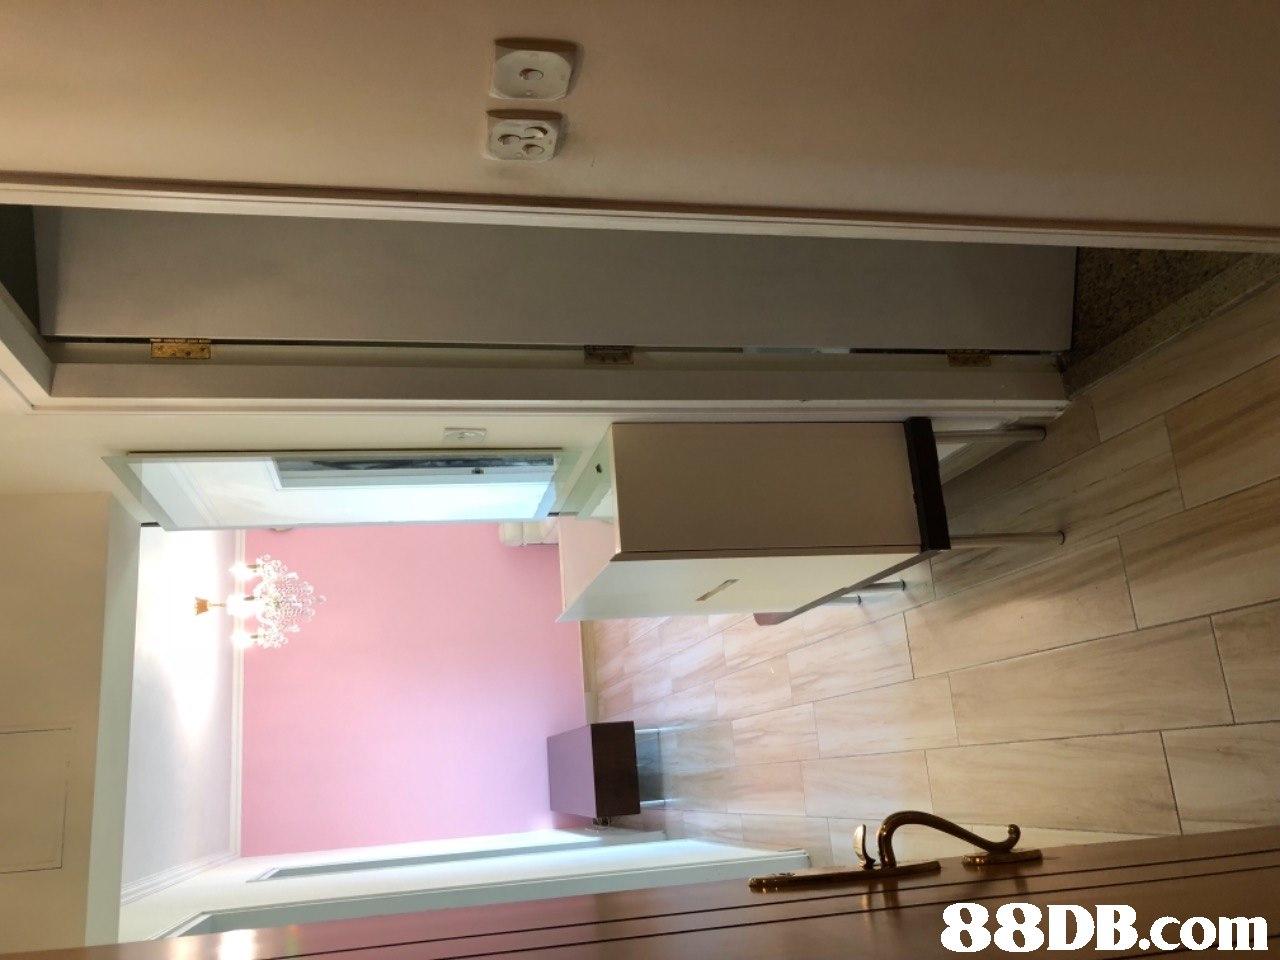 property,ceiling,light,lighting,wall